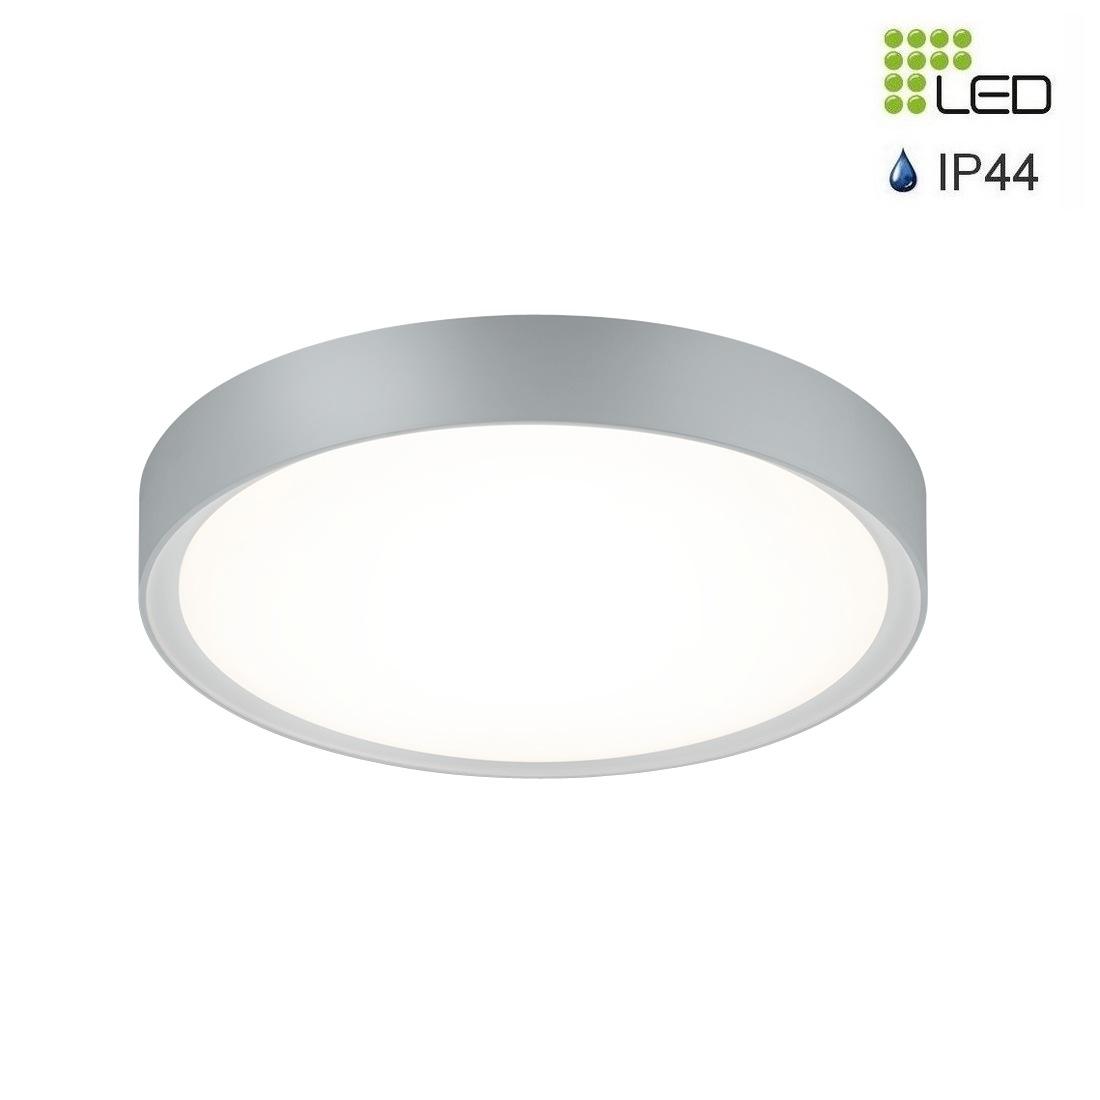 Clarimo plafonnier led rond gris titane 18w 1600 lumens ip44 for Plafonnier exterieur led